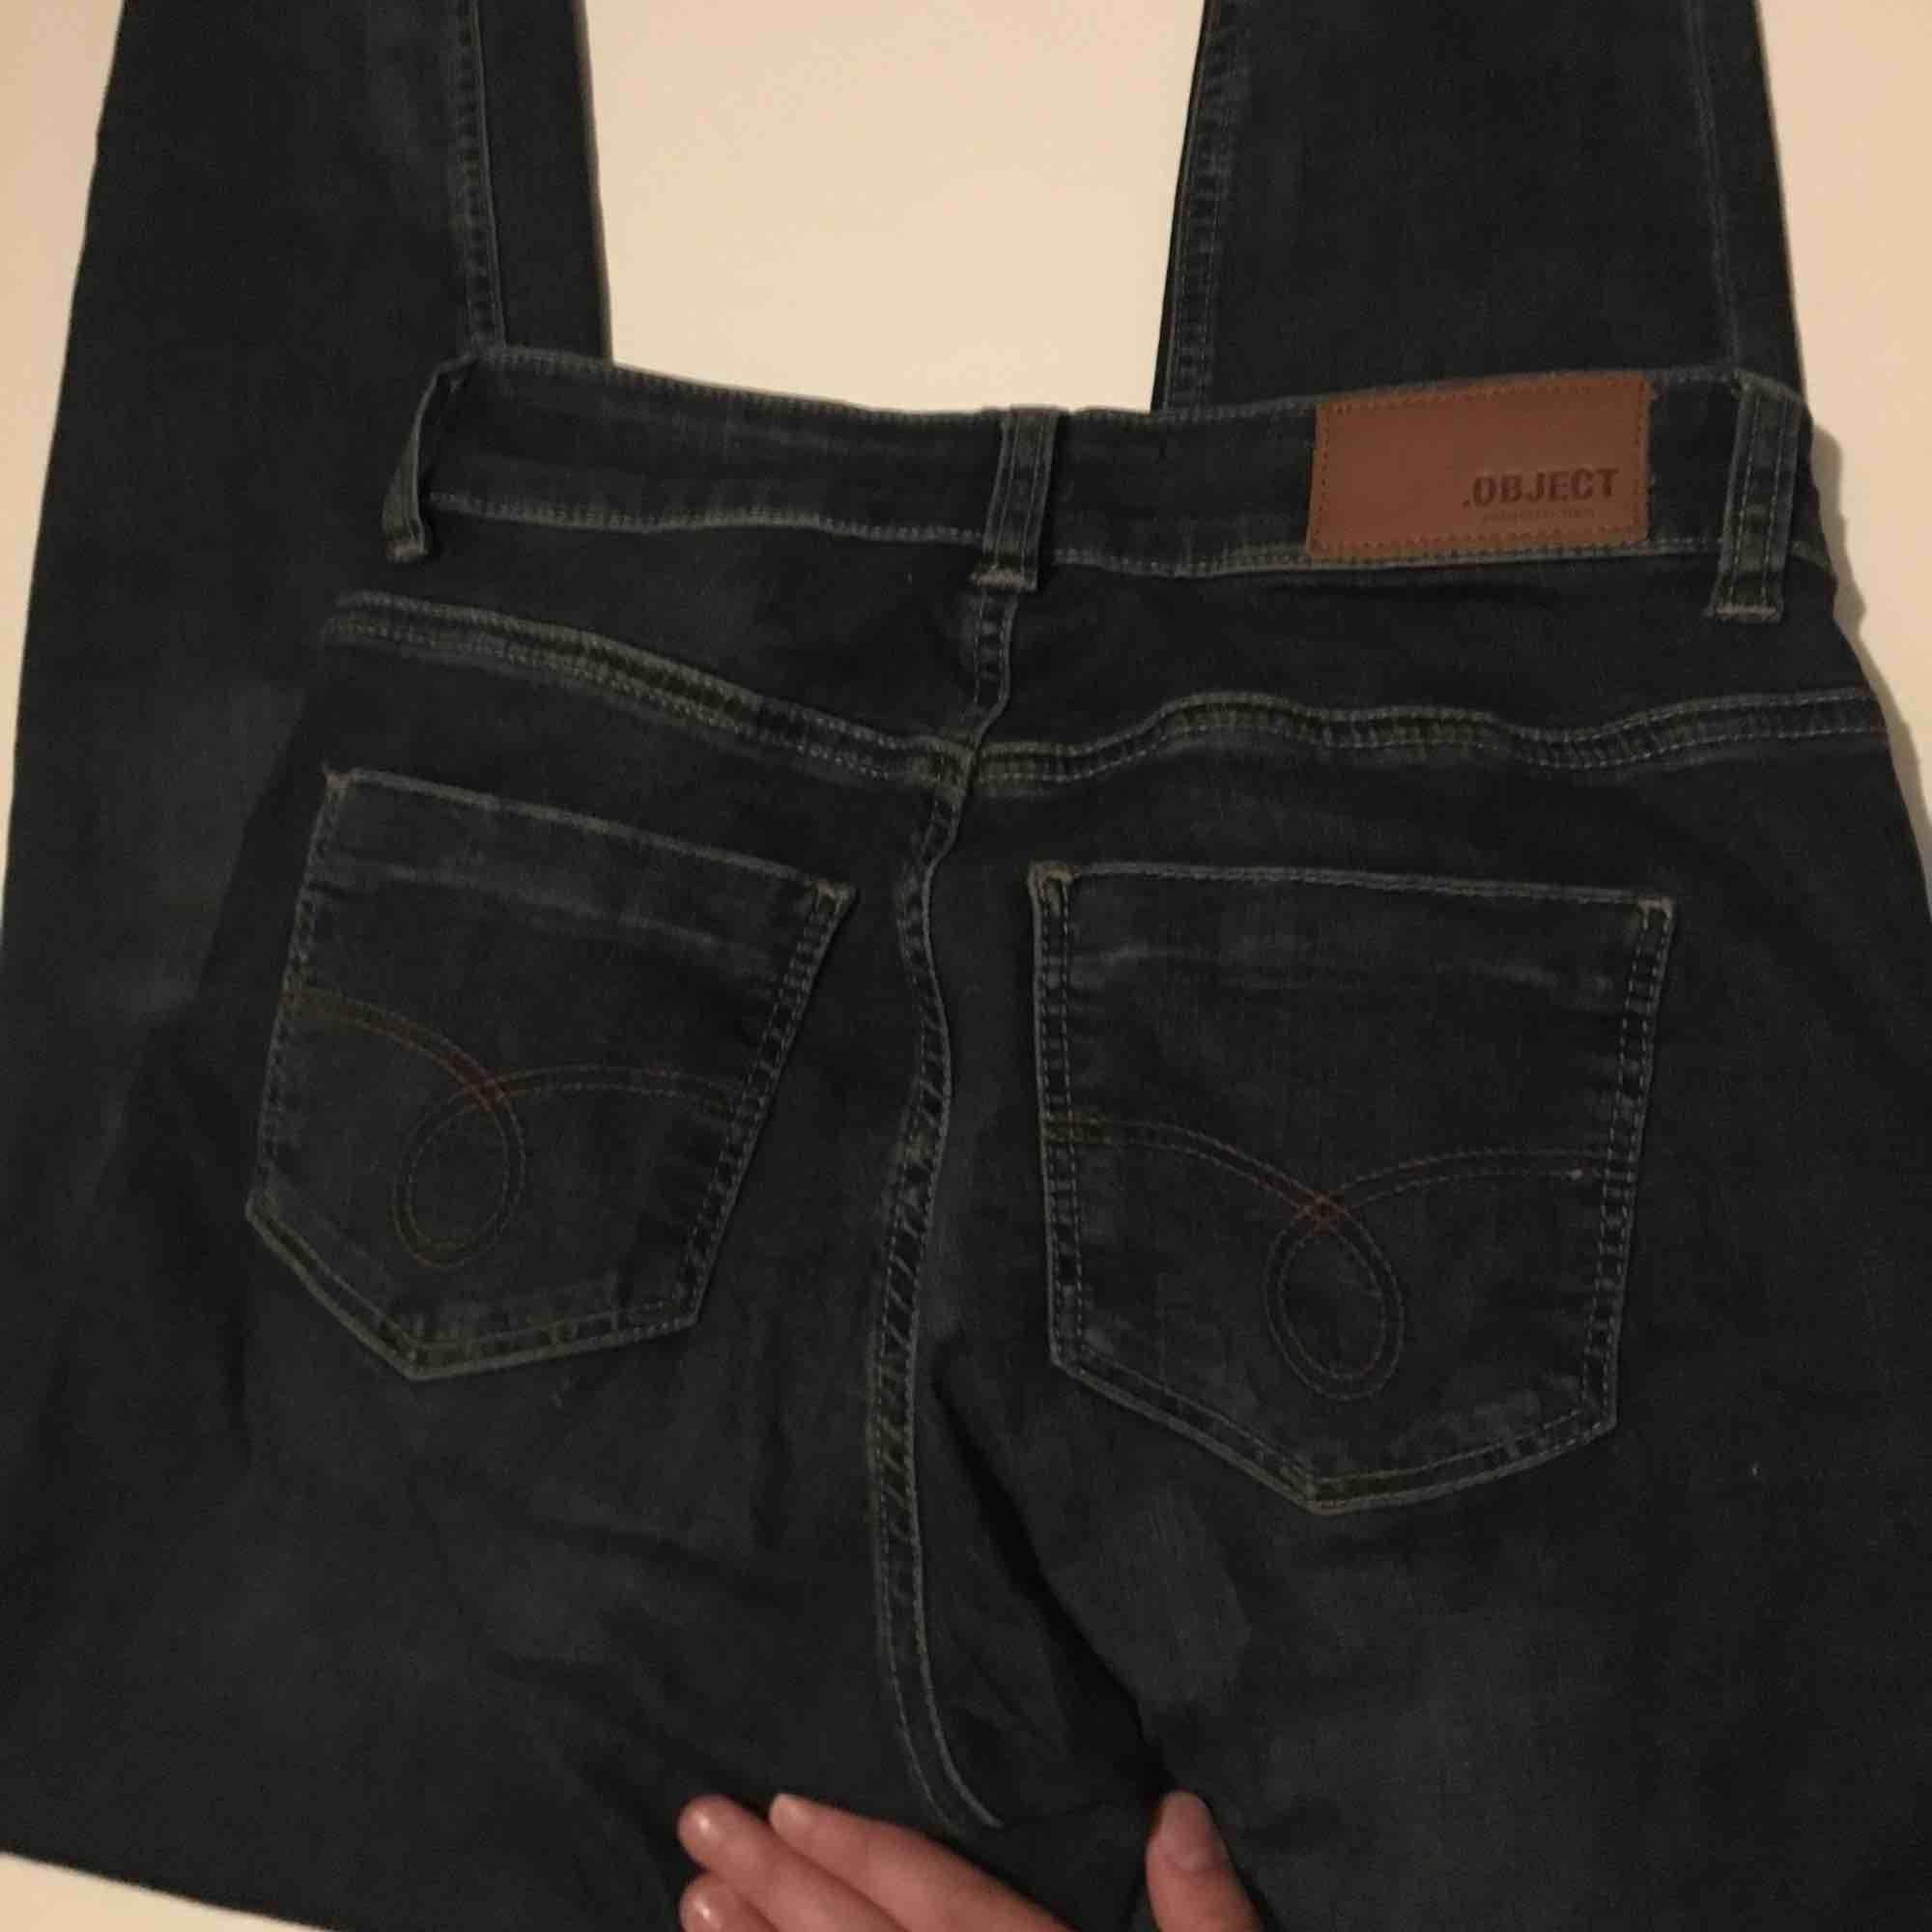 Ett par mörkblåa jeans som nya med en dragkedja i bak av smalbenet. Jeans & Byxor.